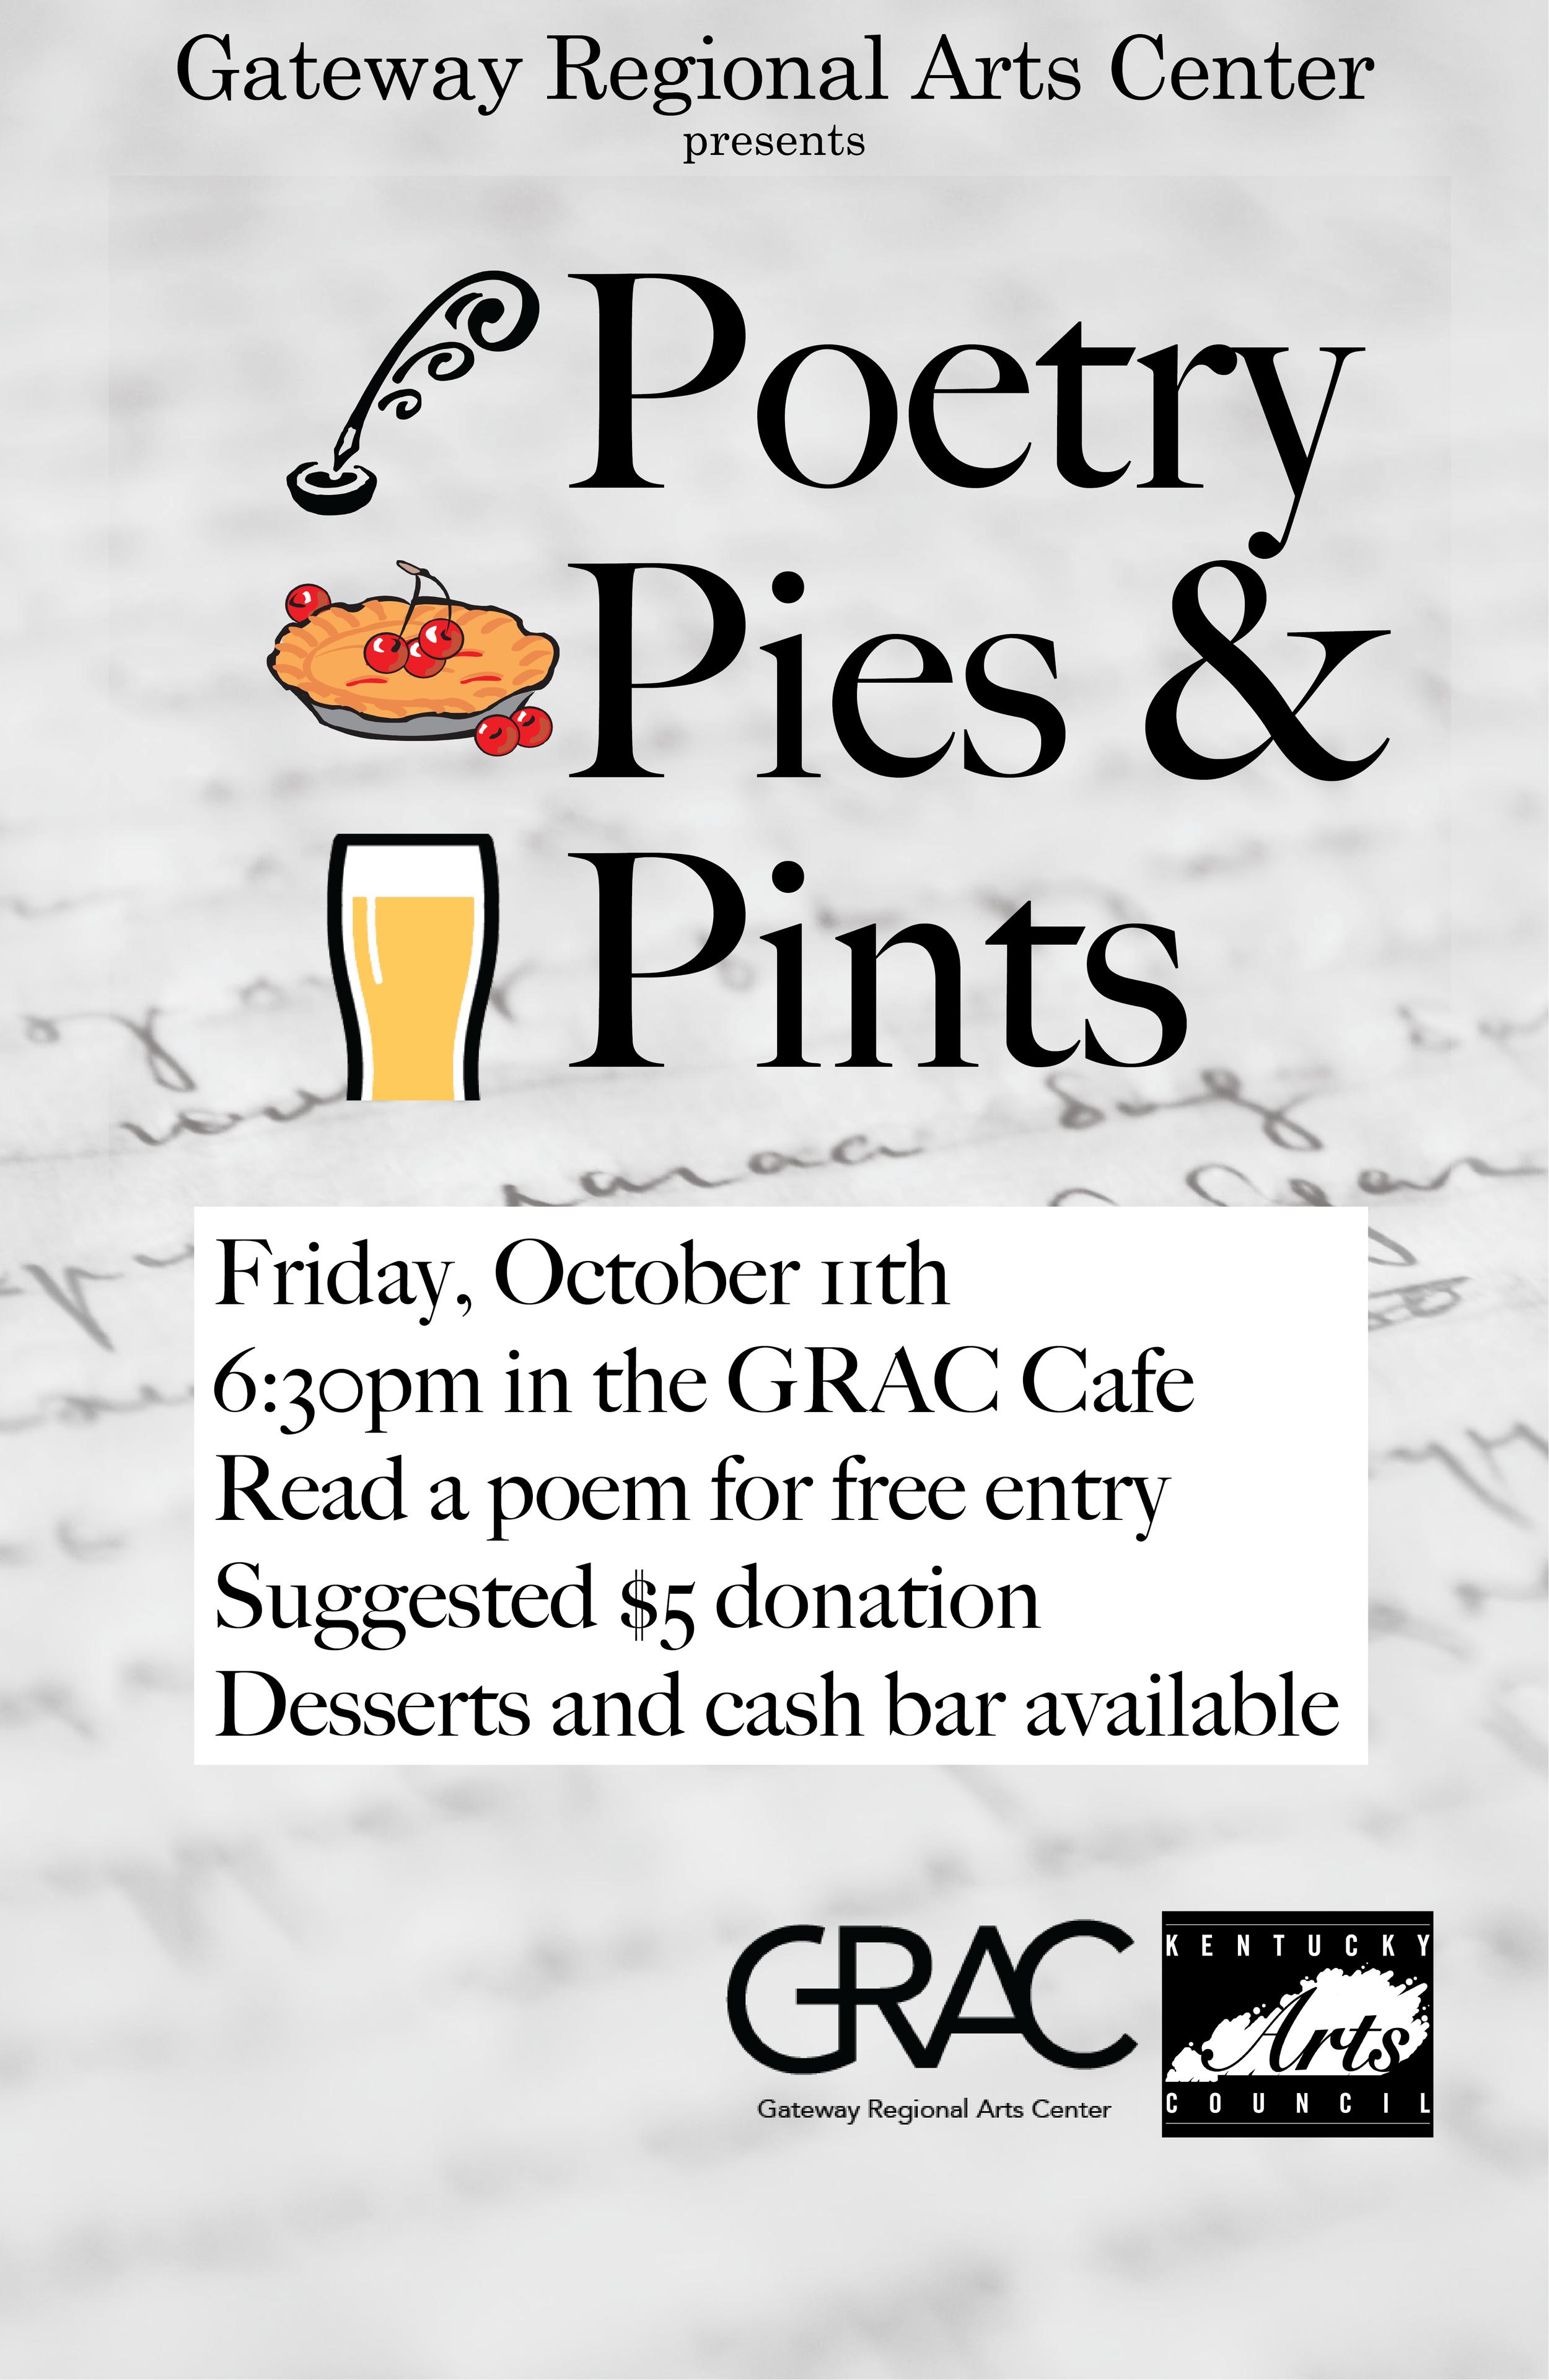 poetrypiespints.png